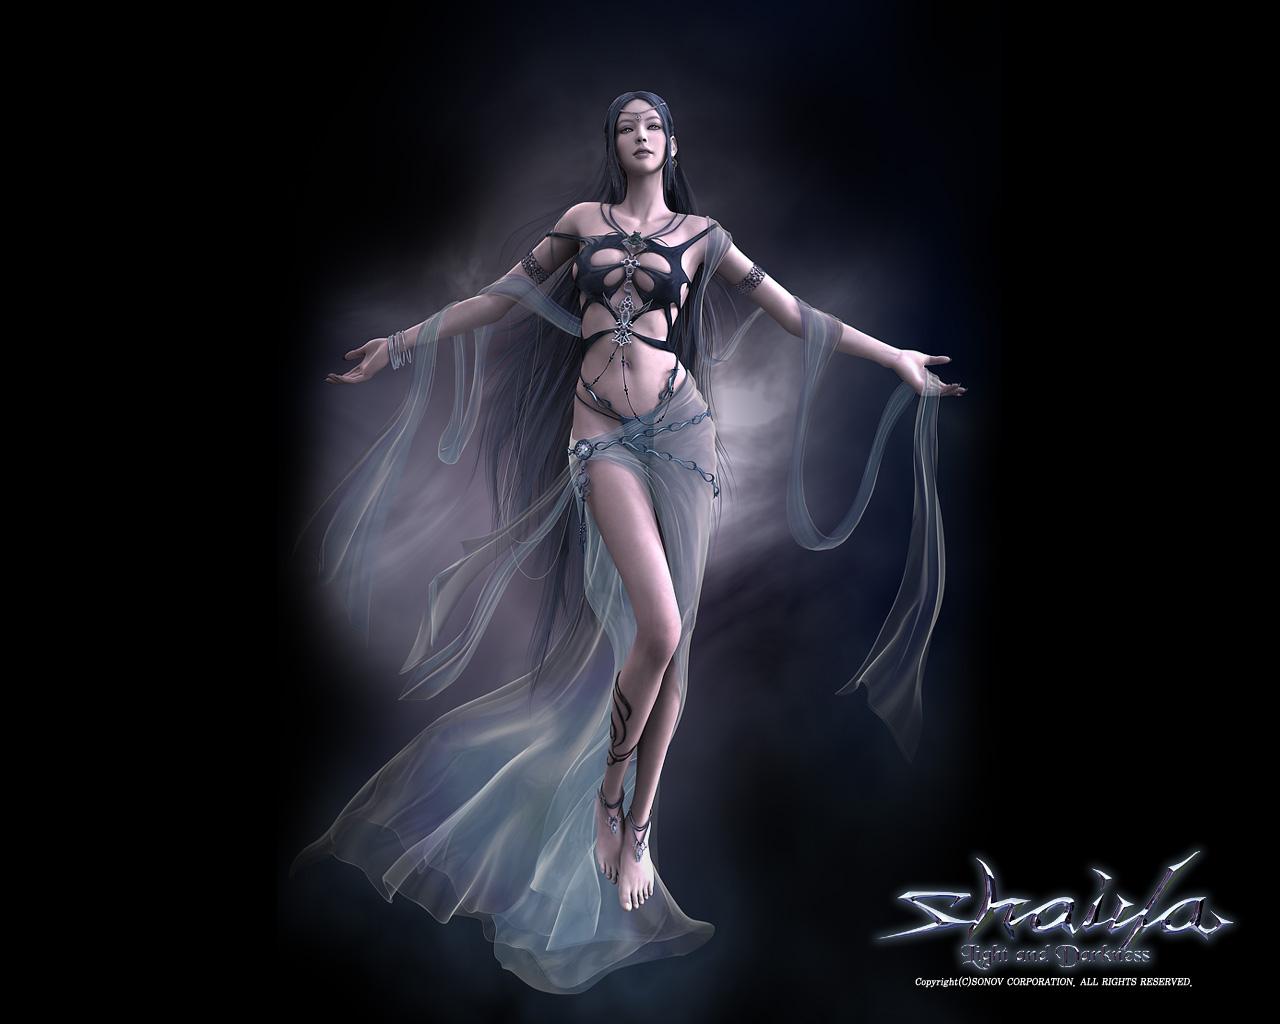 Étaine the dark goddess wallpaper #665792 - zerochan anime image board